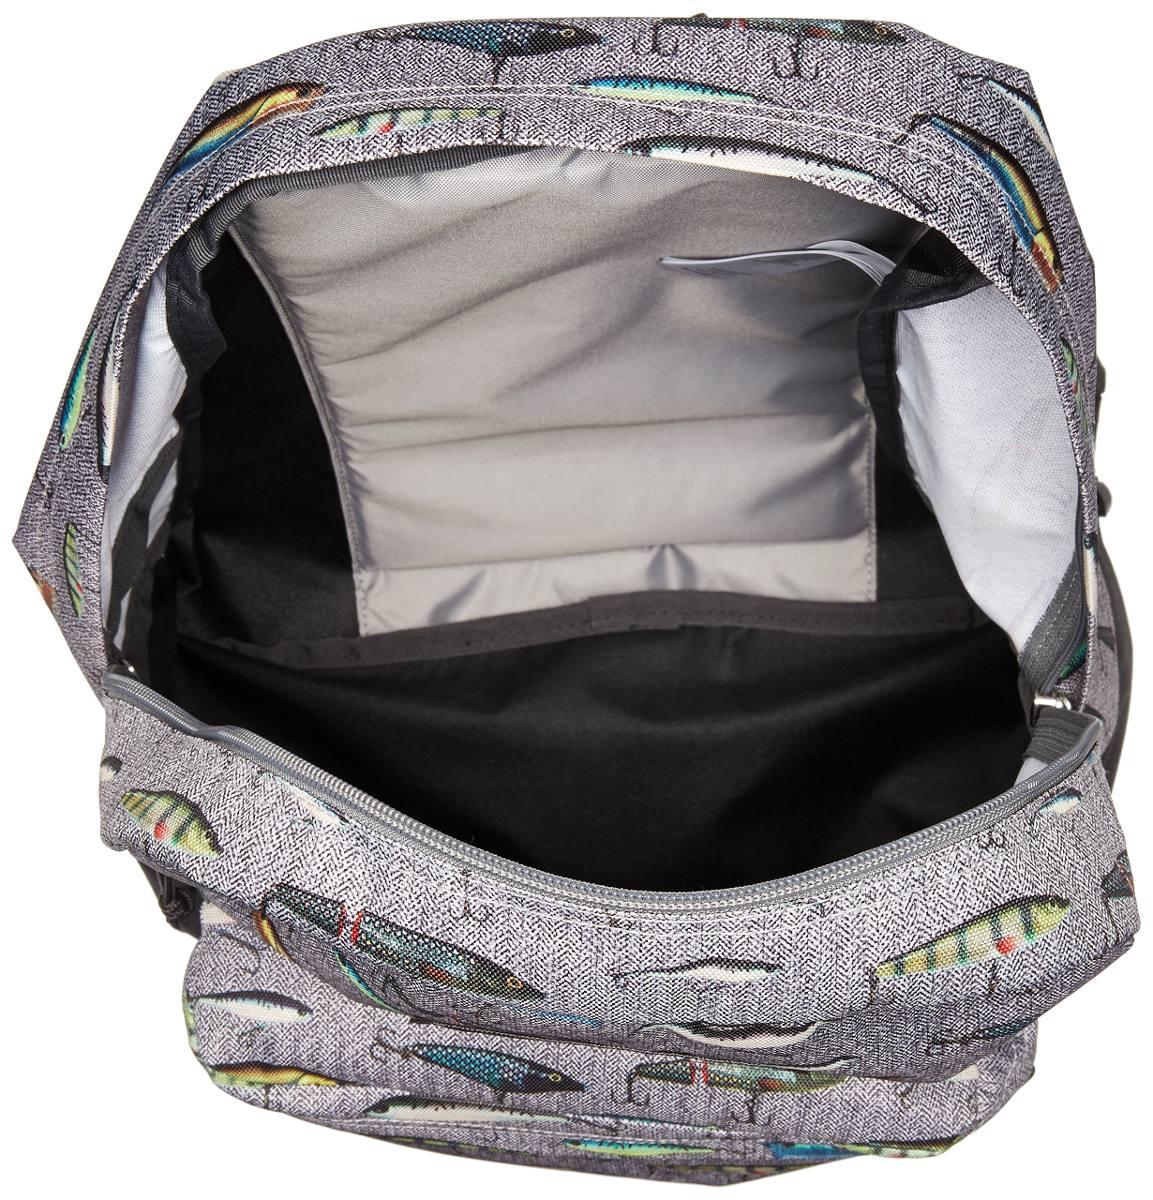 Jansport Black Label Superbreak Special Edition Fading Spots Tas Hatchet Field Tan Muted Green Backpack En Mercado Libre 1153x1200